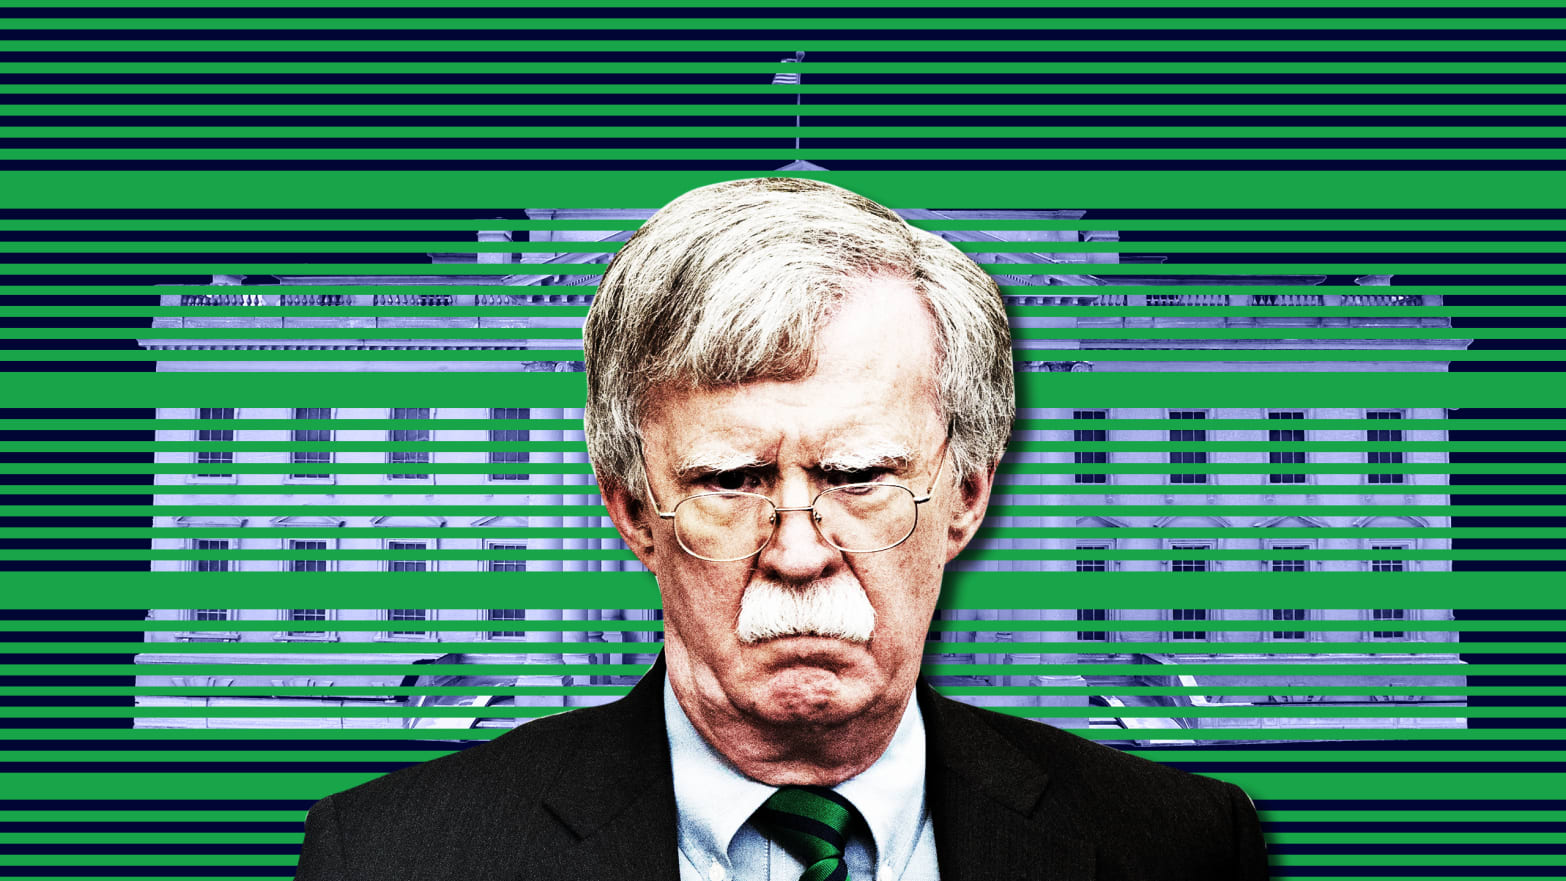 John Bolton Brings a Nuclear Superhawk Into the White House